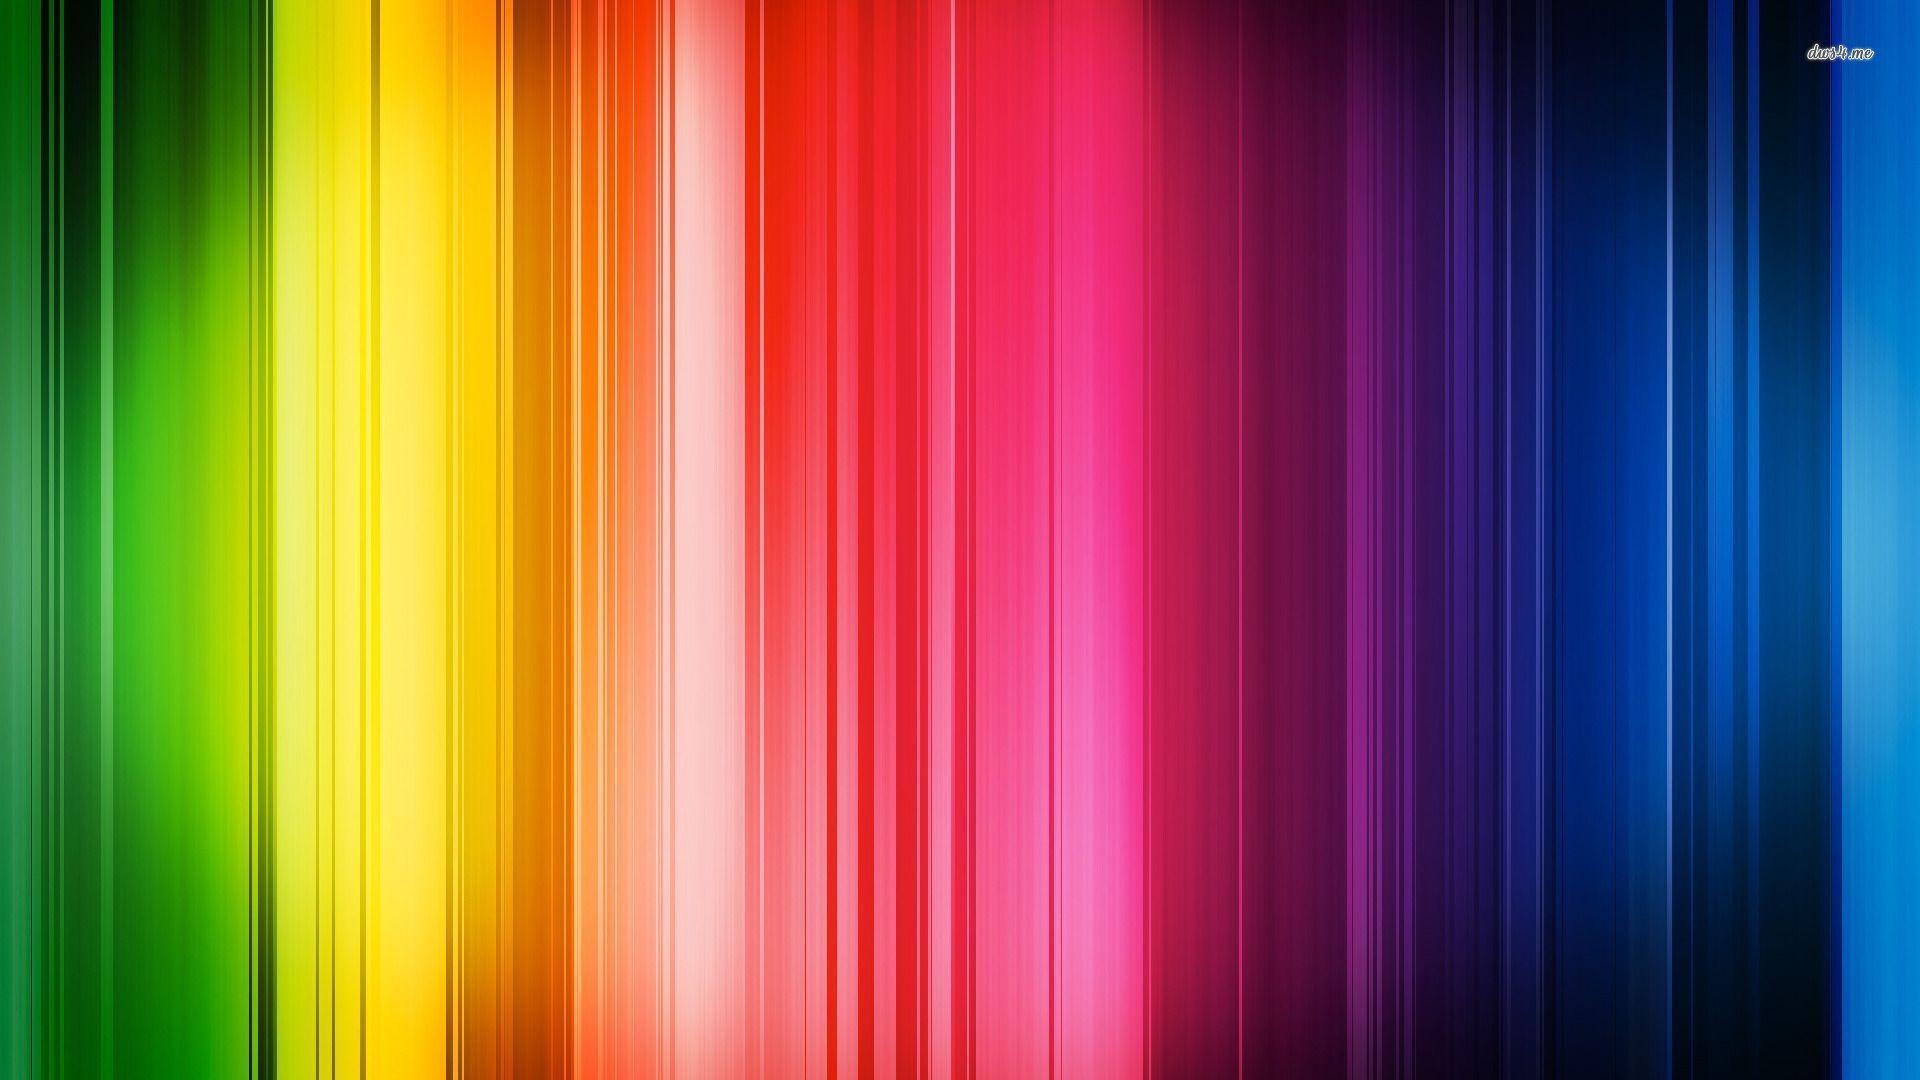 Vibrant wallpaper 1080p